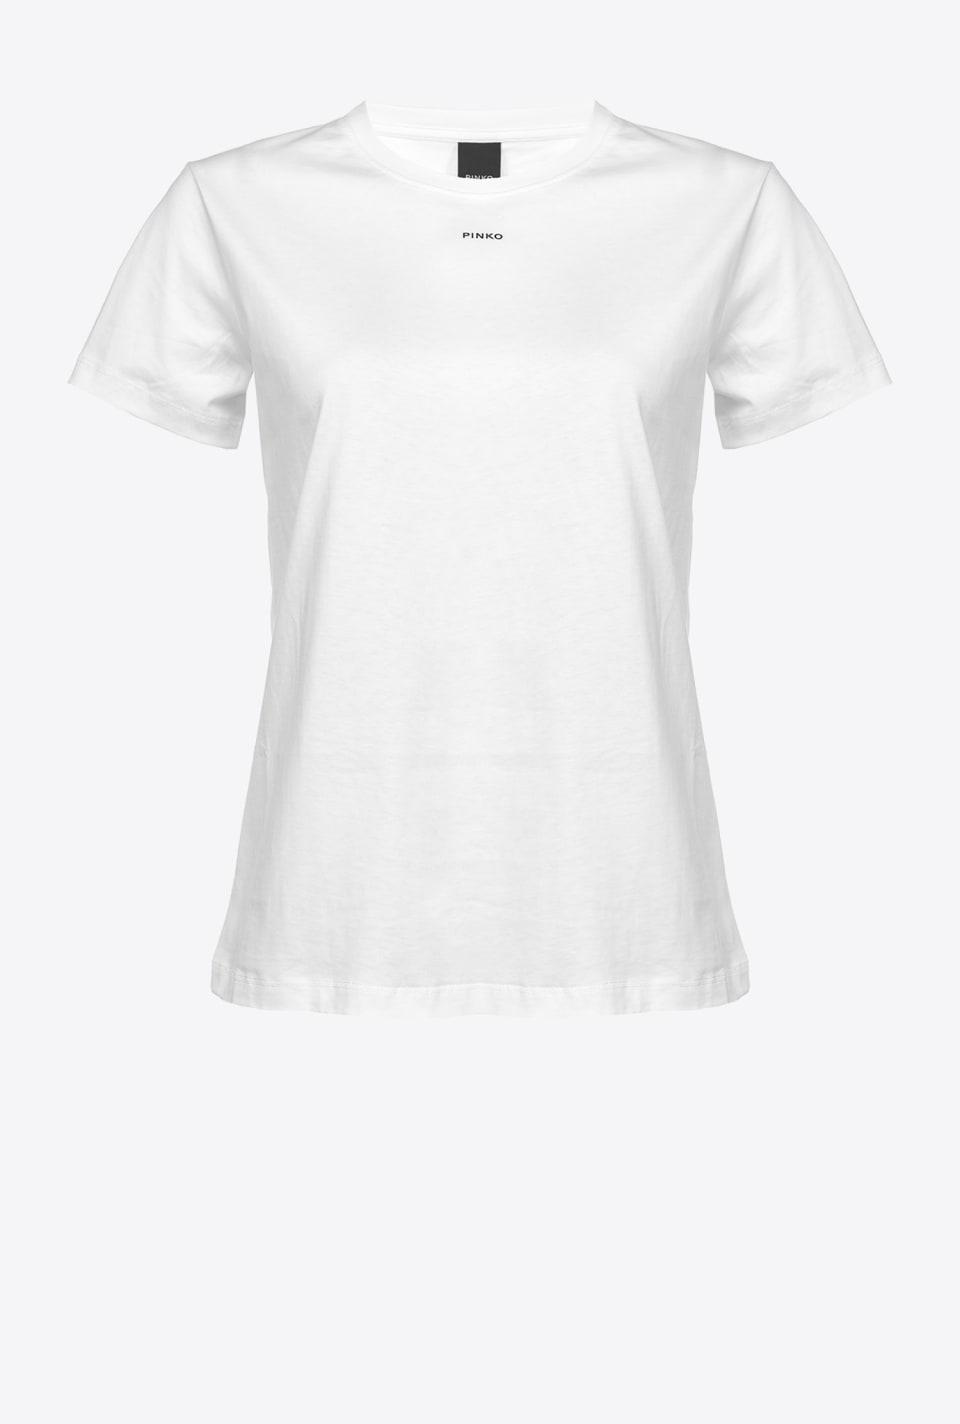 T-shirt with micro PINKO logo - Pinko